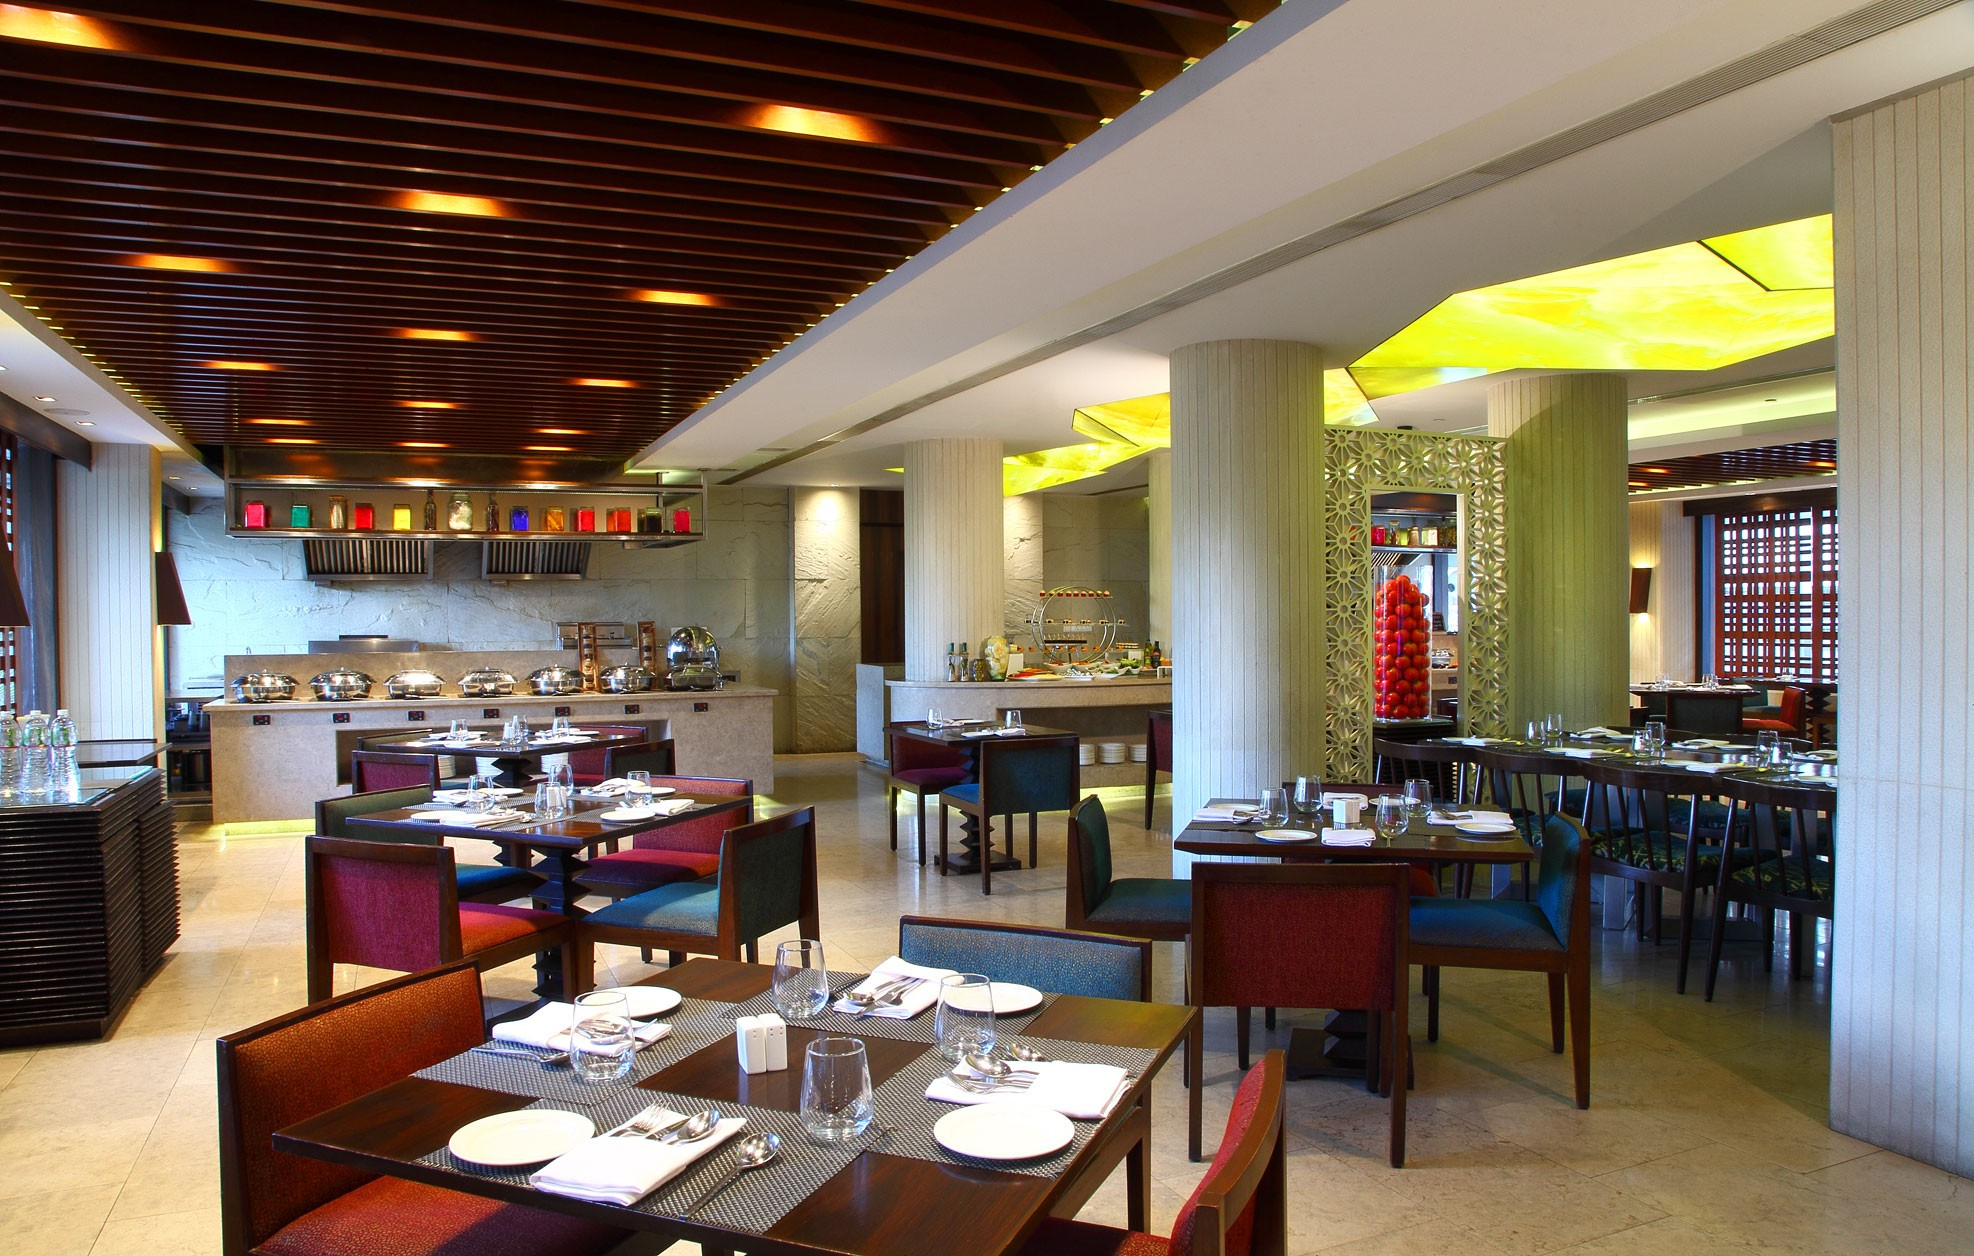 House of Asia - The Mirador Hotel